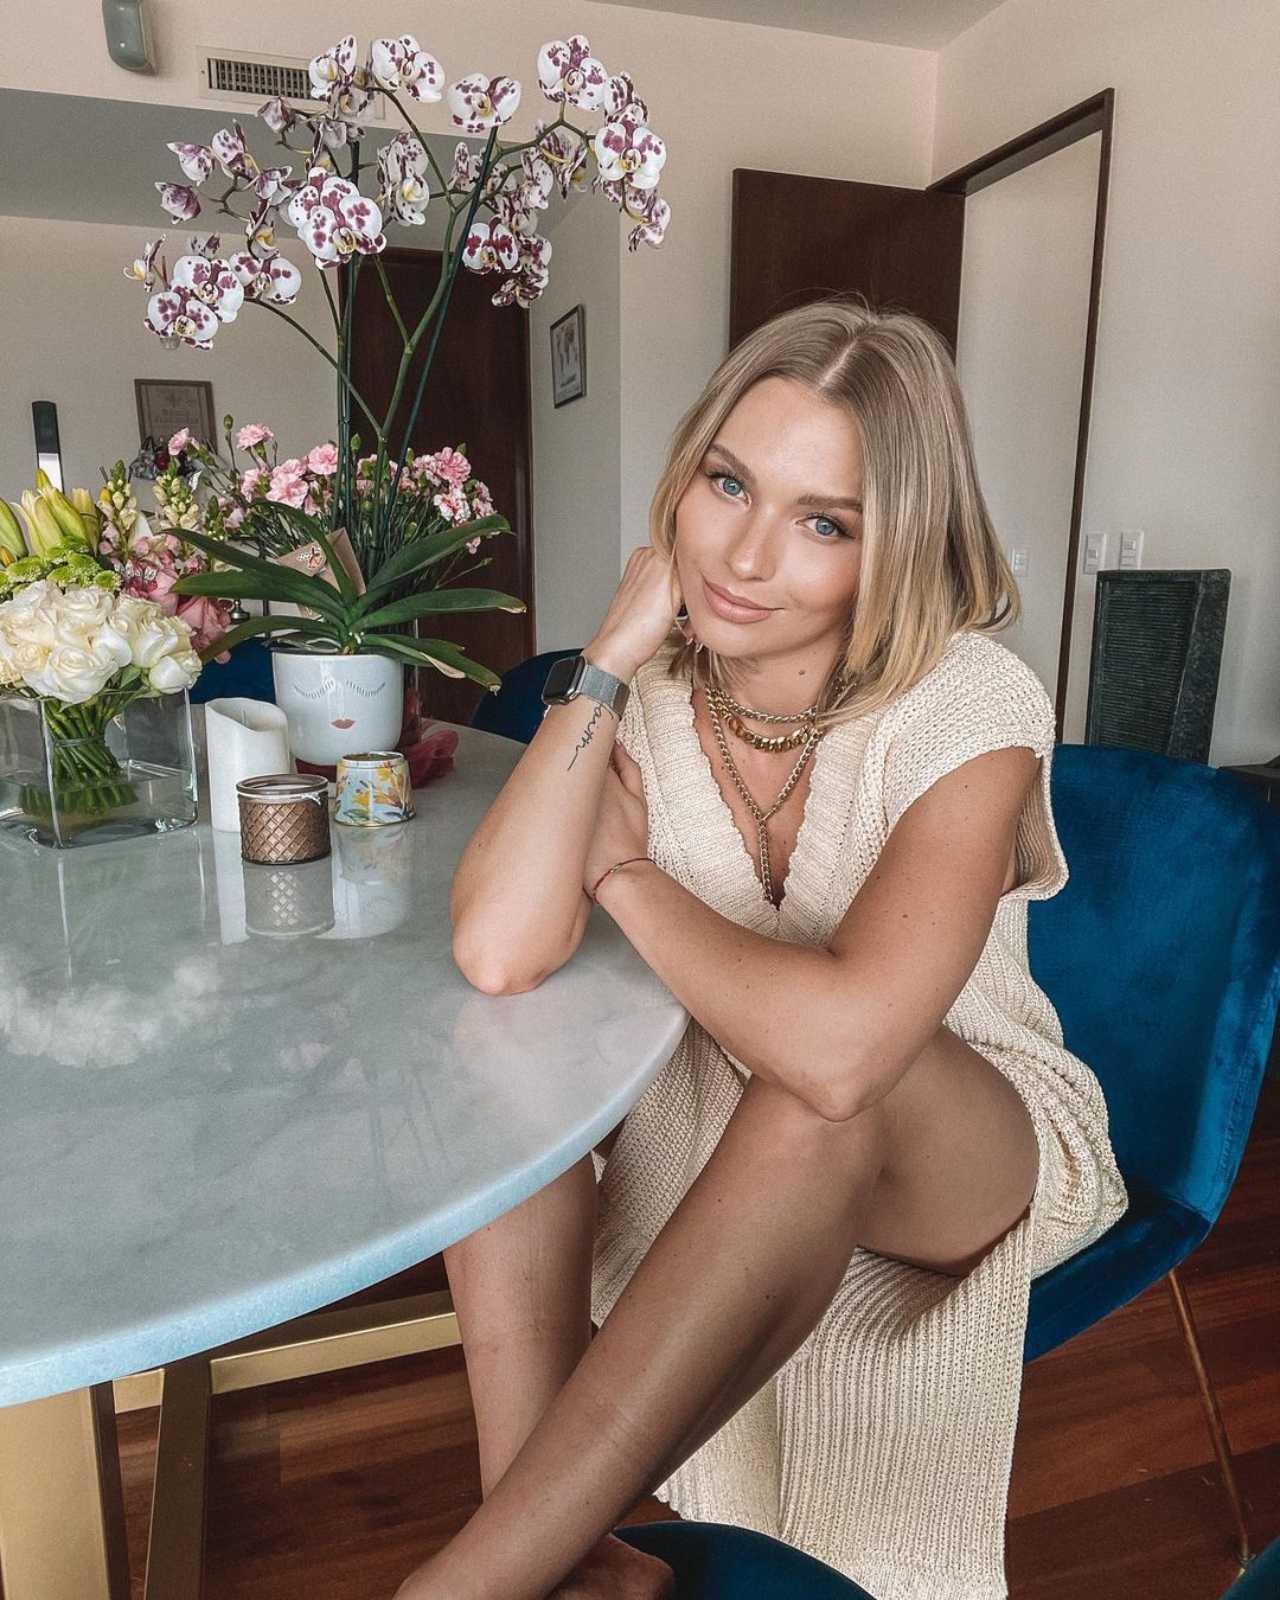 Irina Baeva con look beige